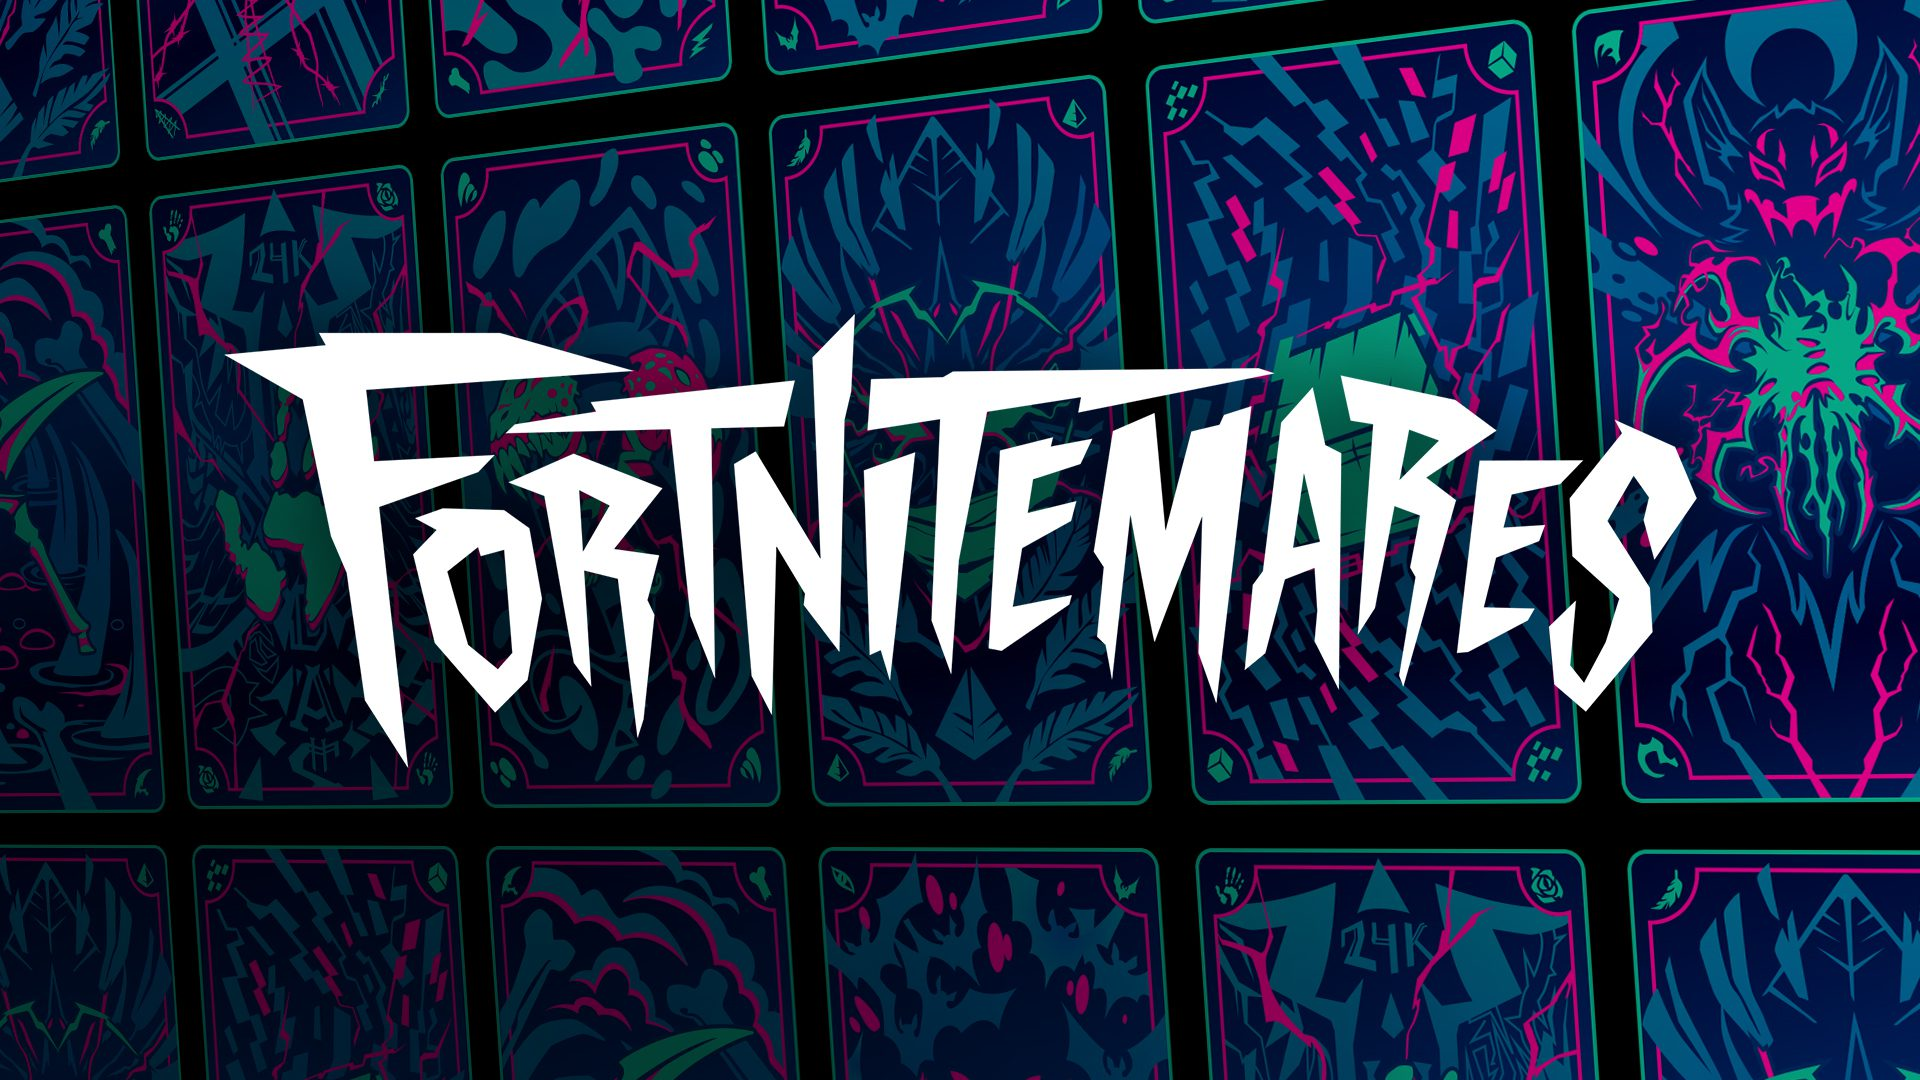 Halloween-event Fortnitemares terug in Fortnite Season 8